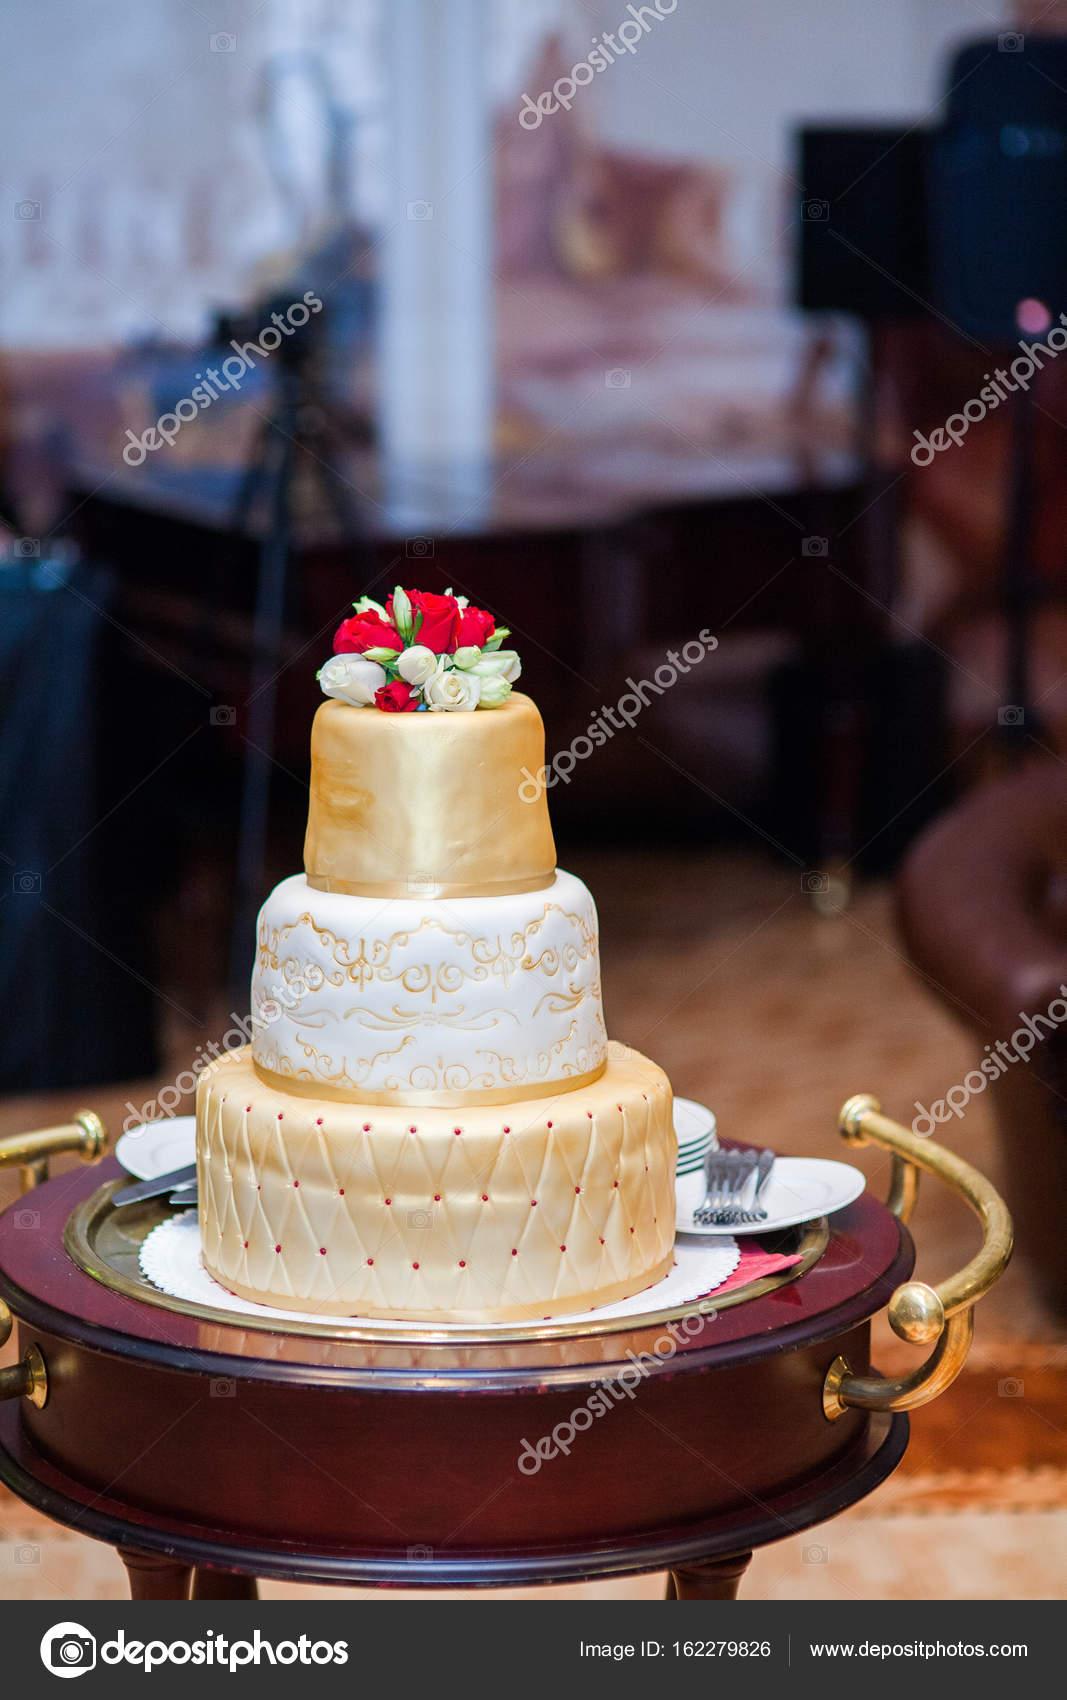 Grosse Goldene Hochzeit Torte Stockfoto C Laeda 162279826